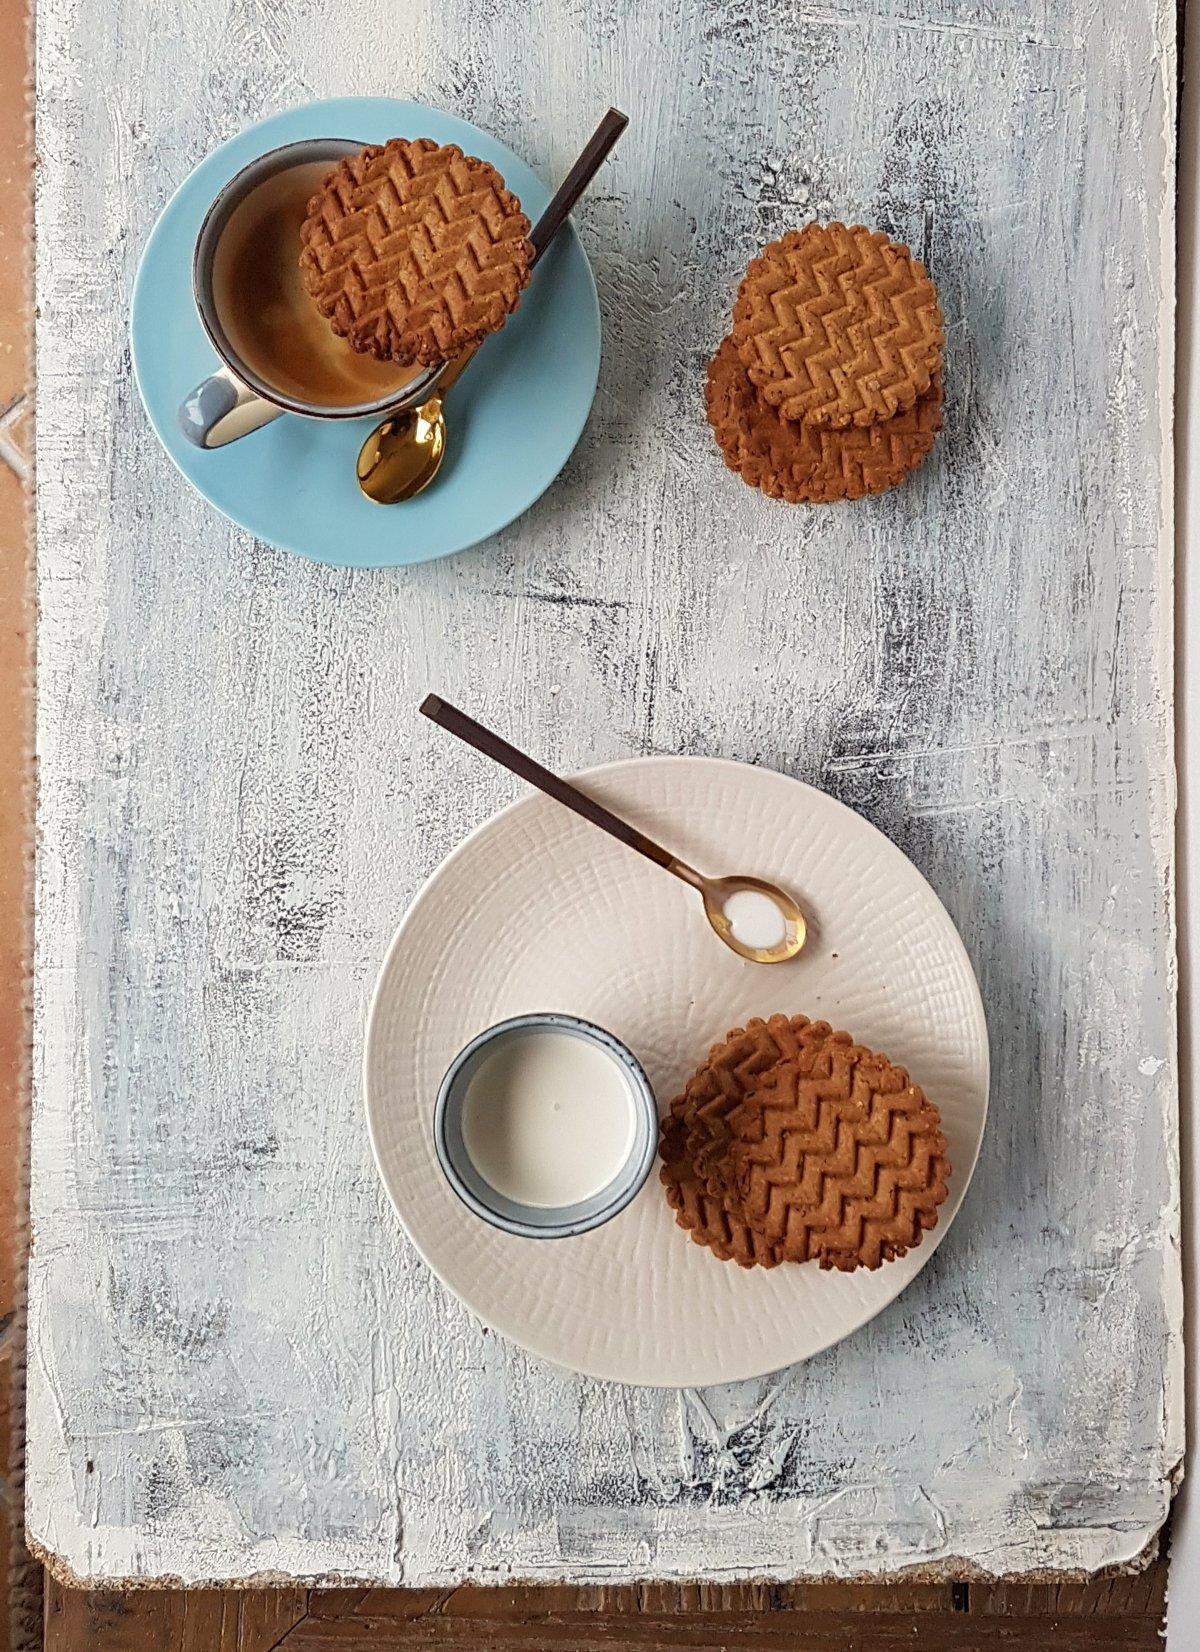 Hazelnut cookies photo sansung